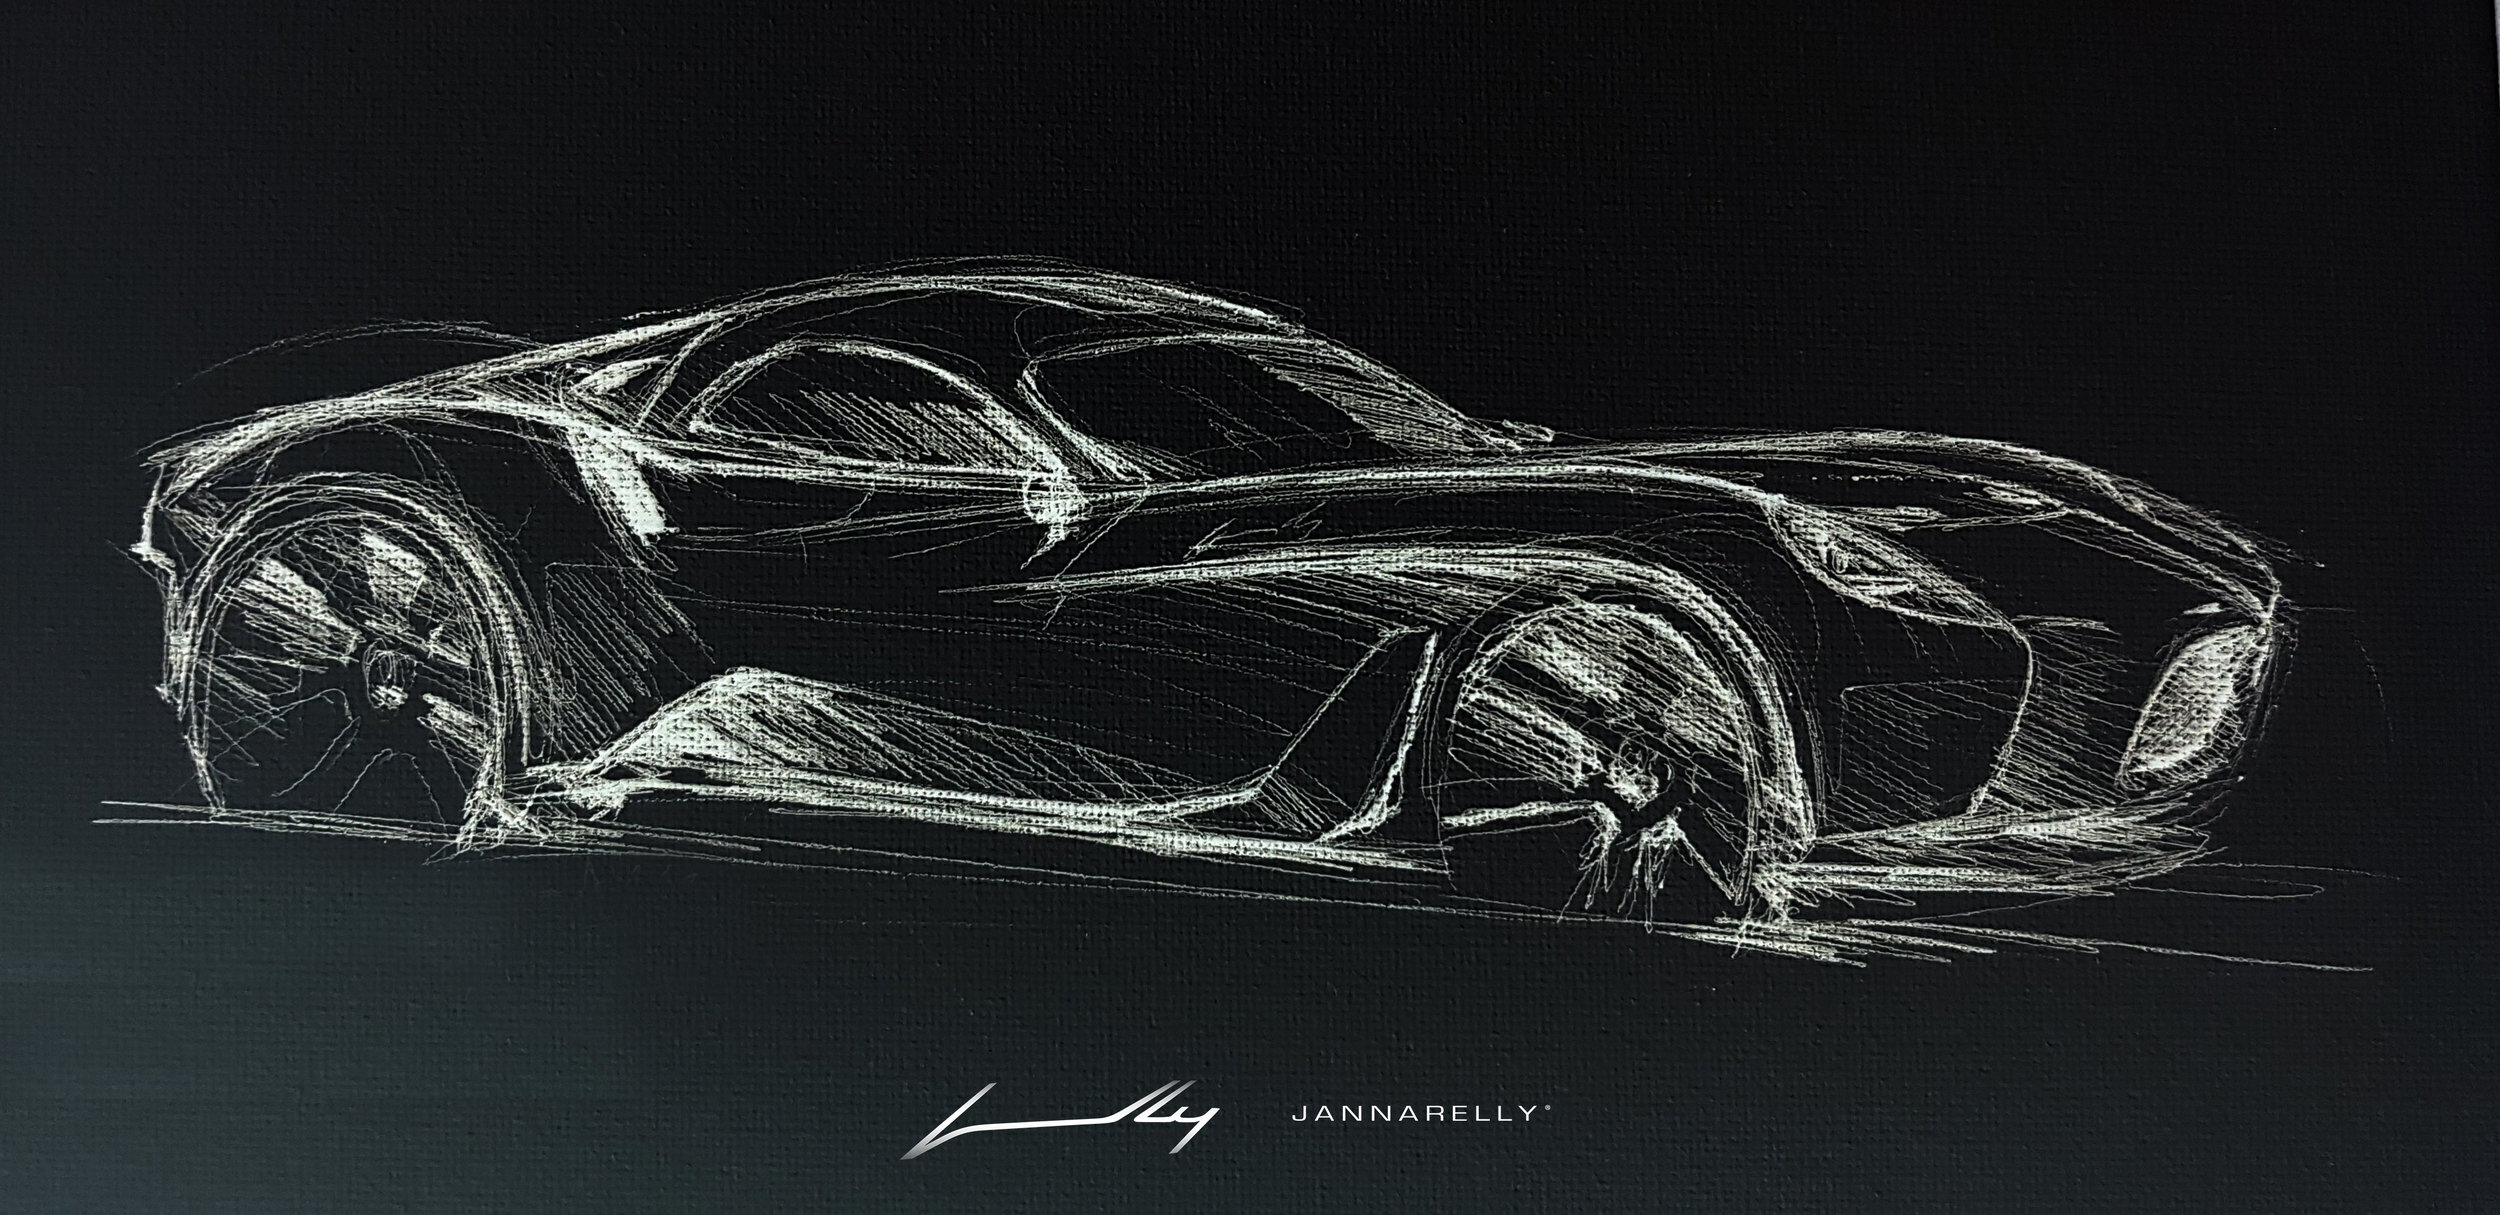 Jannarelly-France-Design-187.jpg